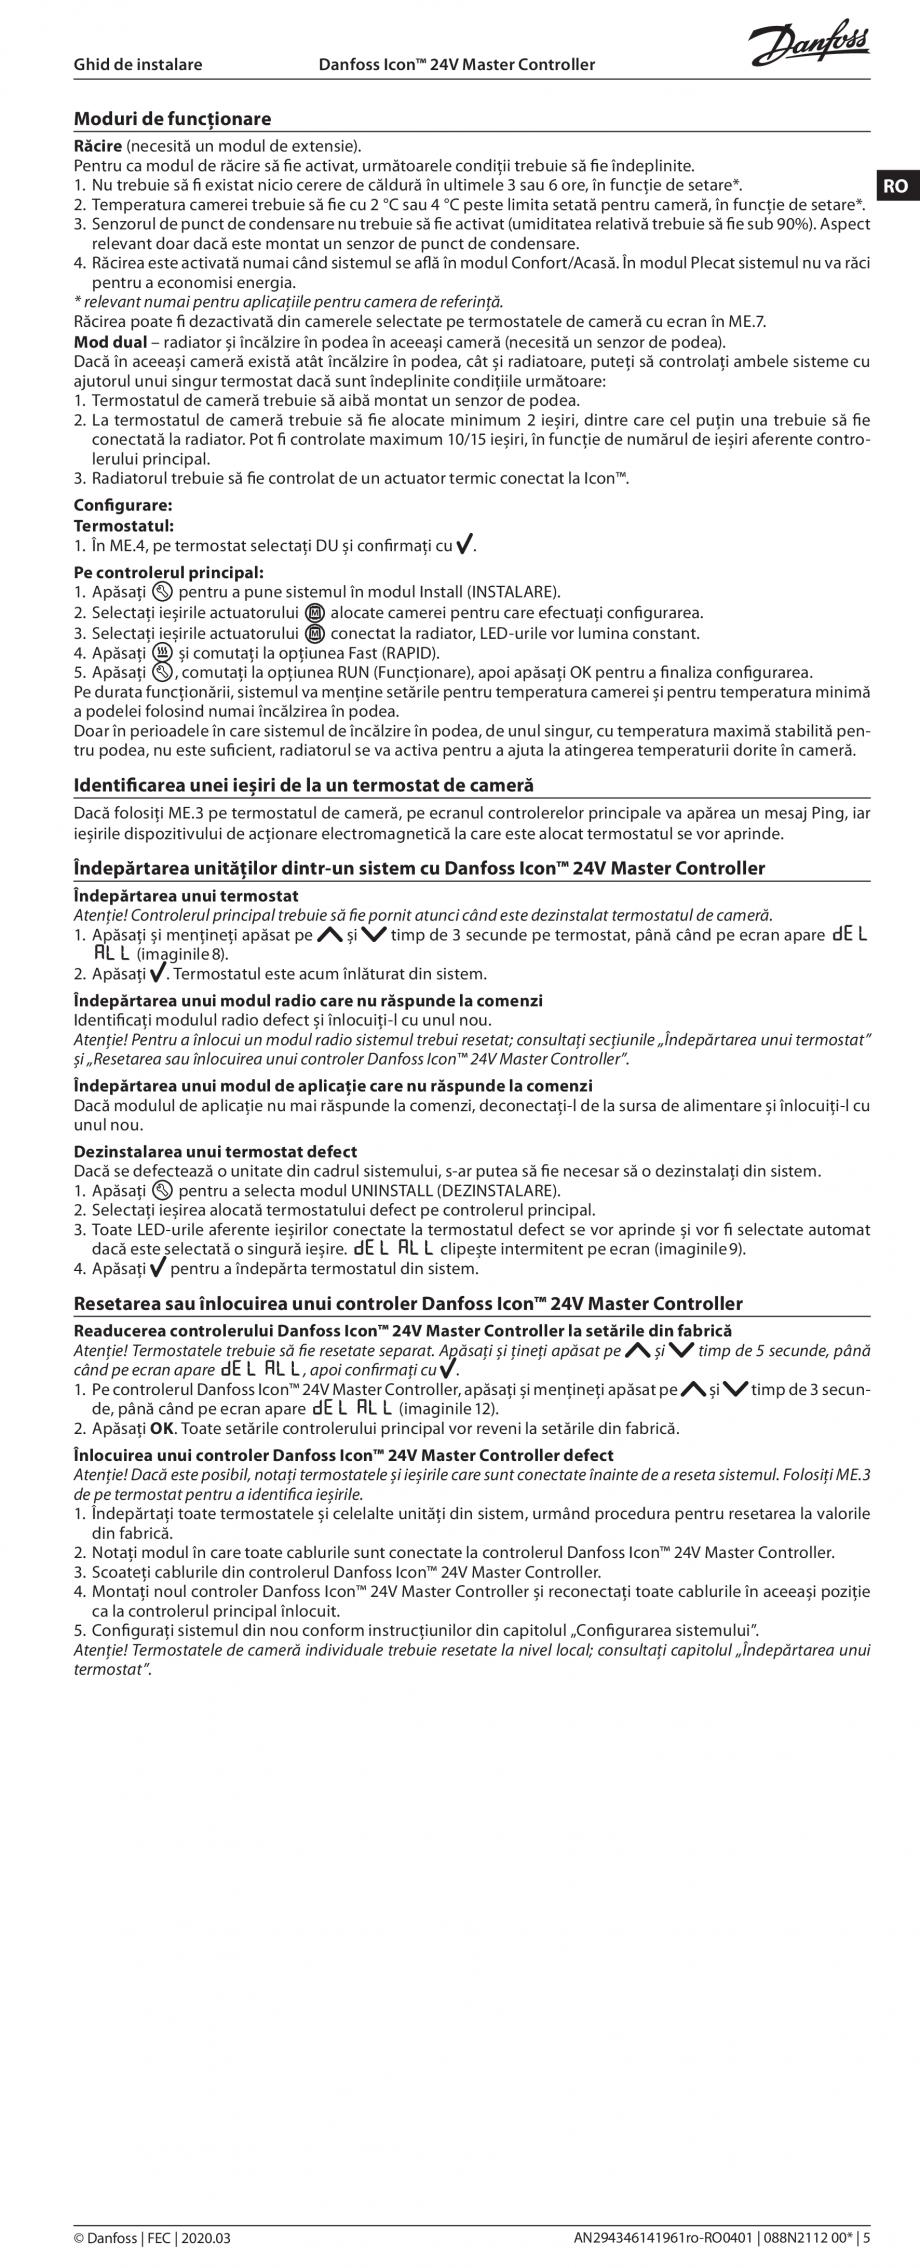 Pagina 5 - Ghid de instalare pentru Danfoss Icon™ 24V Master Controller - sistem inteligent de...